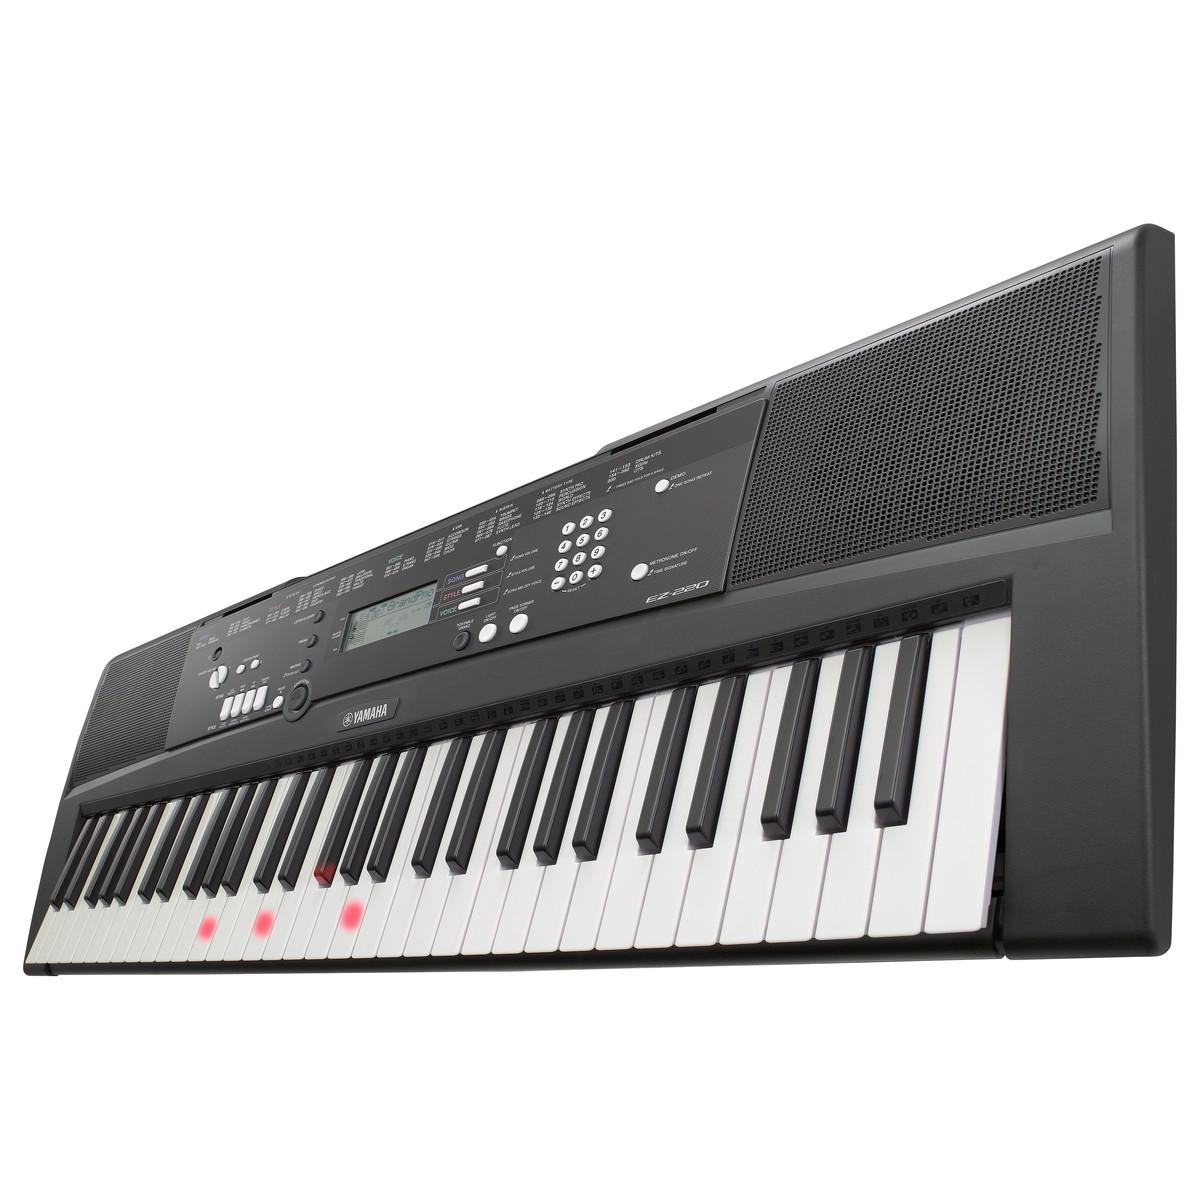 Yamaha EZ220 Keyboard med 61 Belyste Tangenter   Gear4music